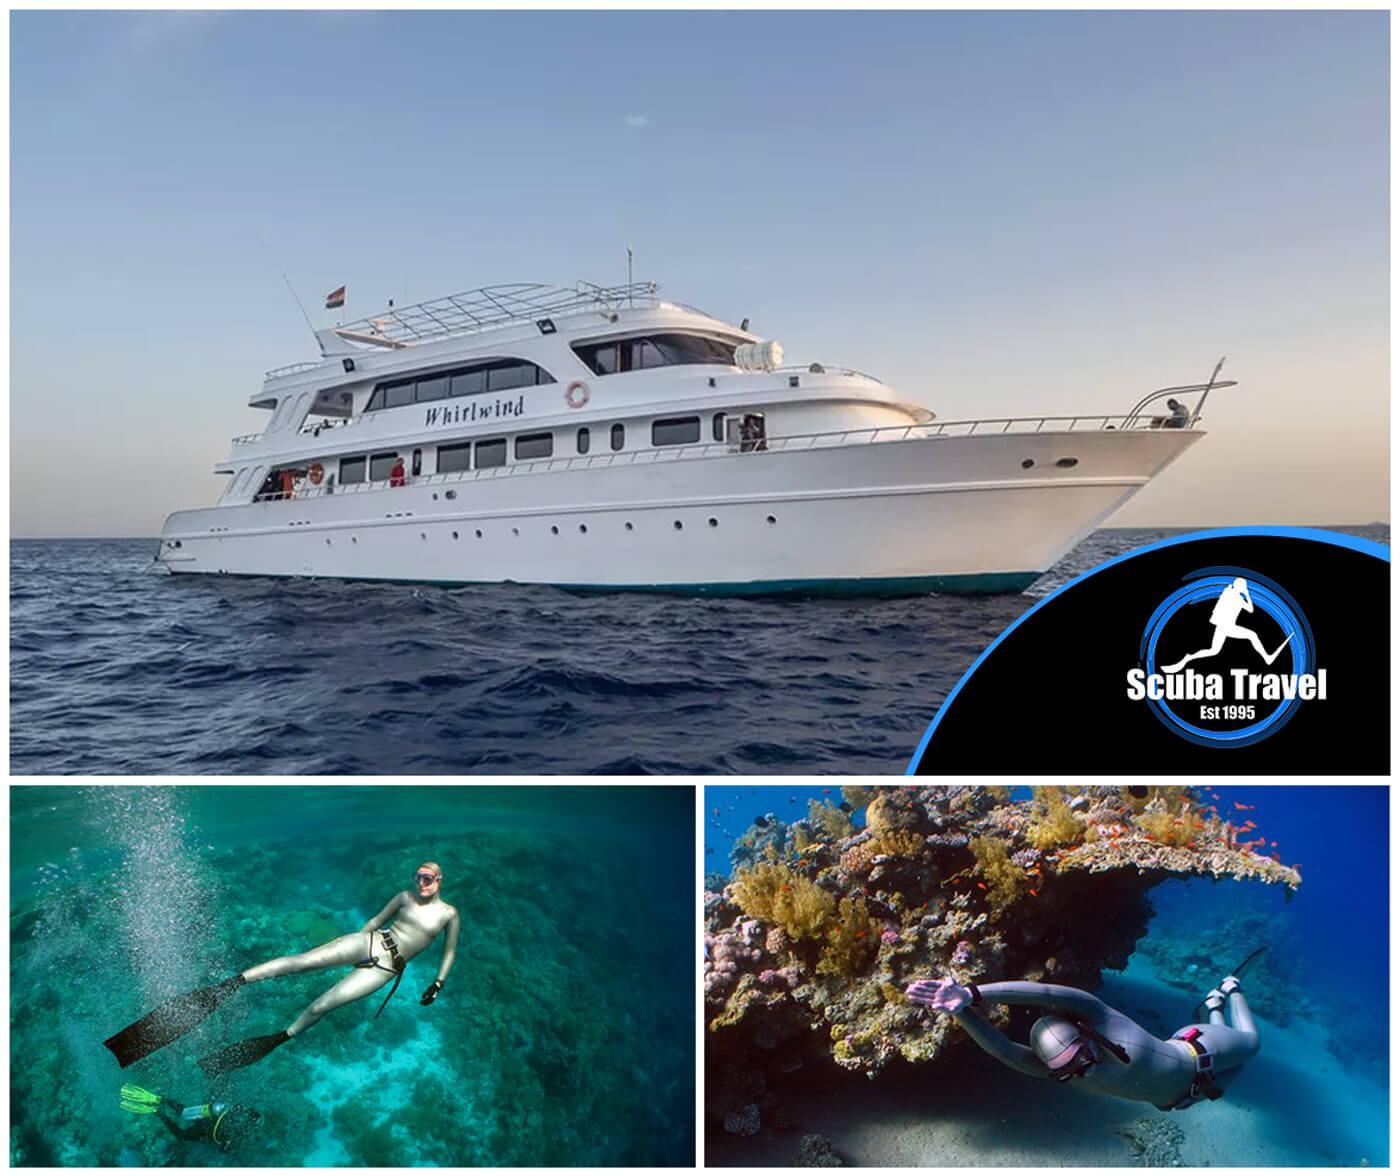 Scuba Travel, Freediving, Emma Farrell, Whirlwind